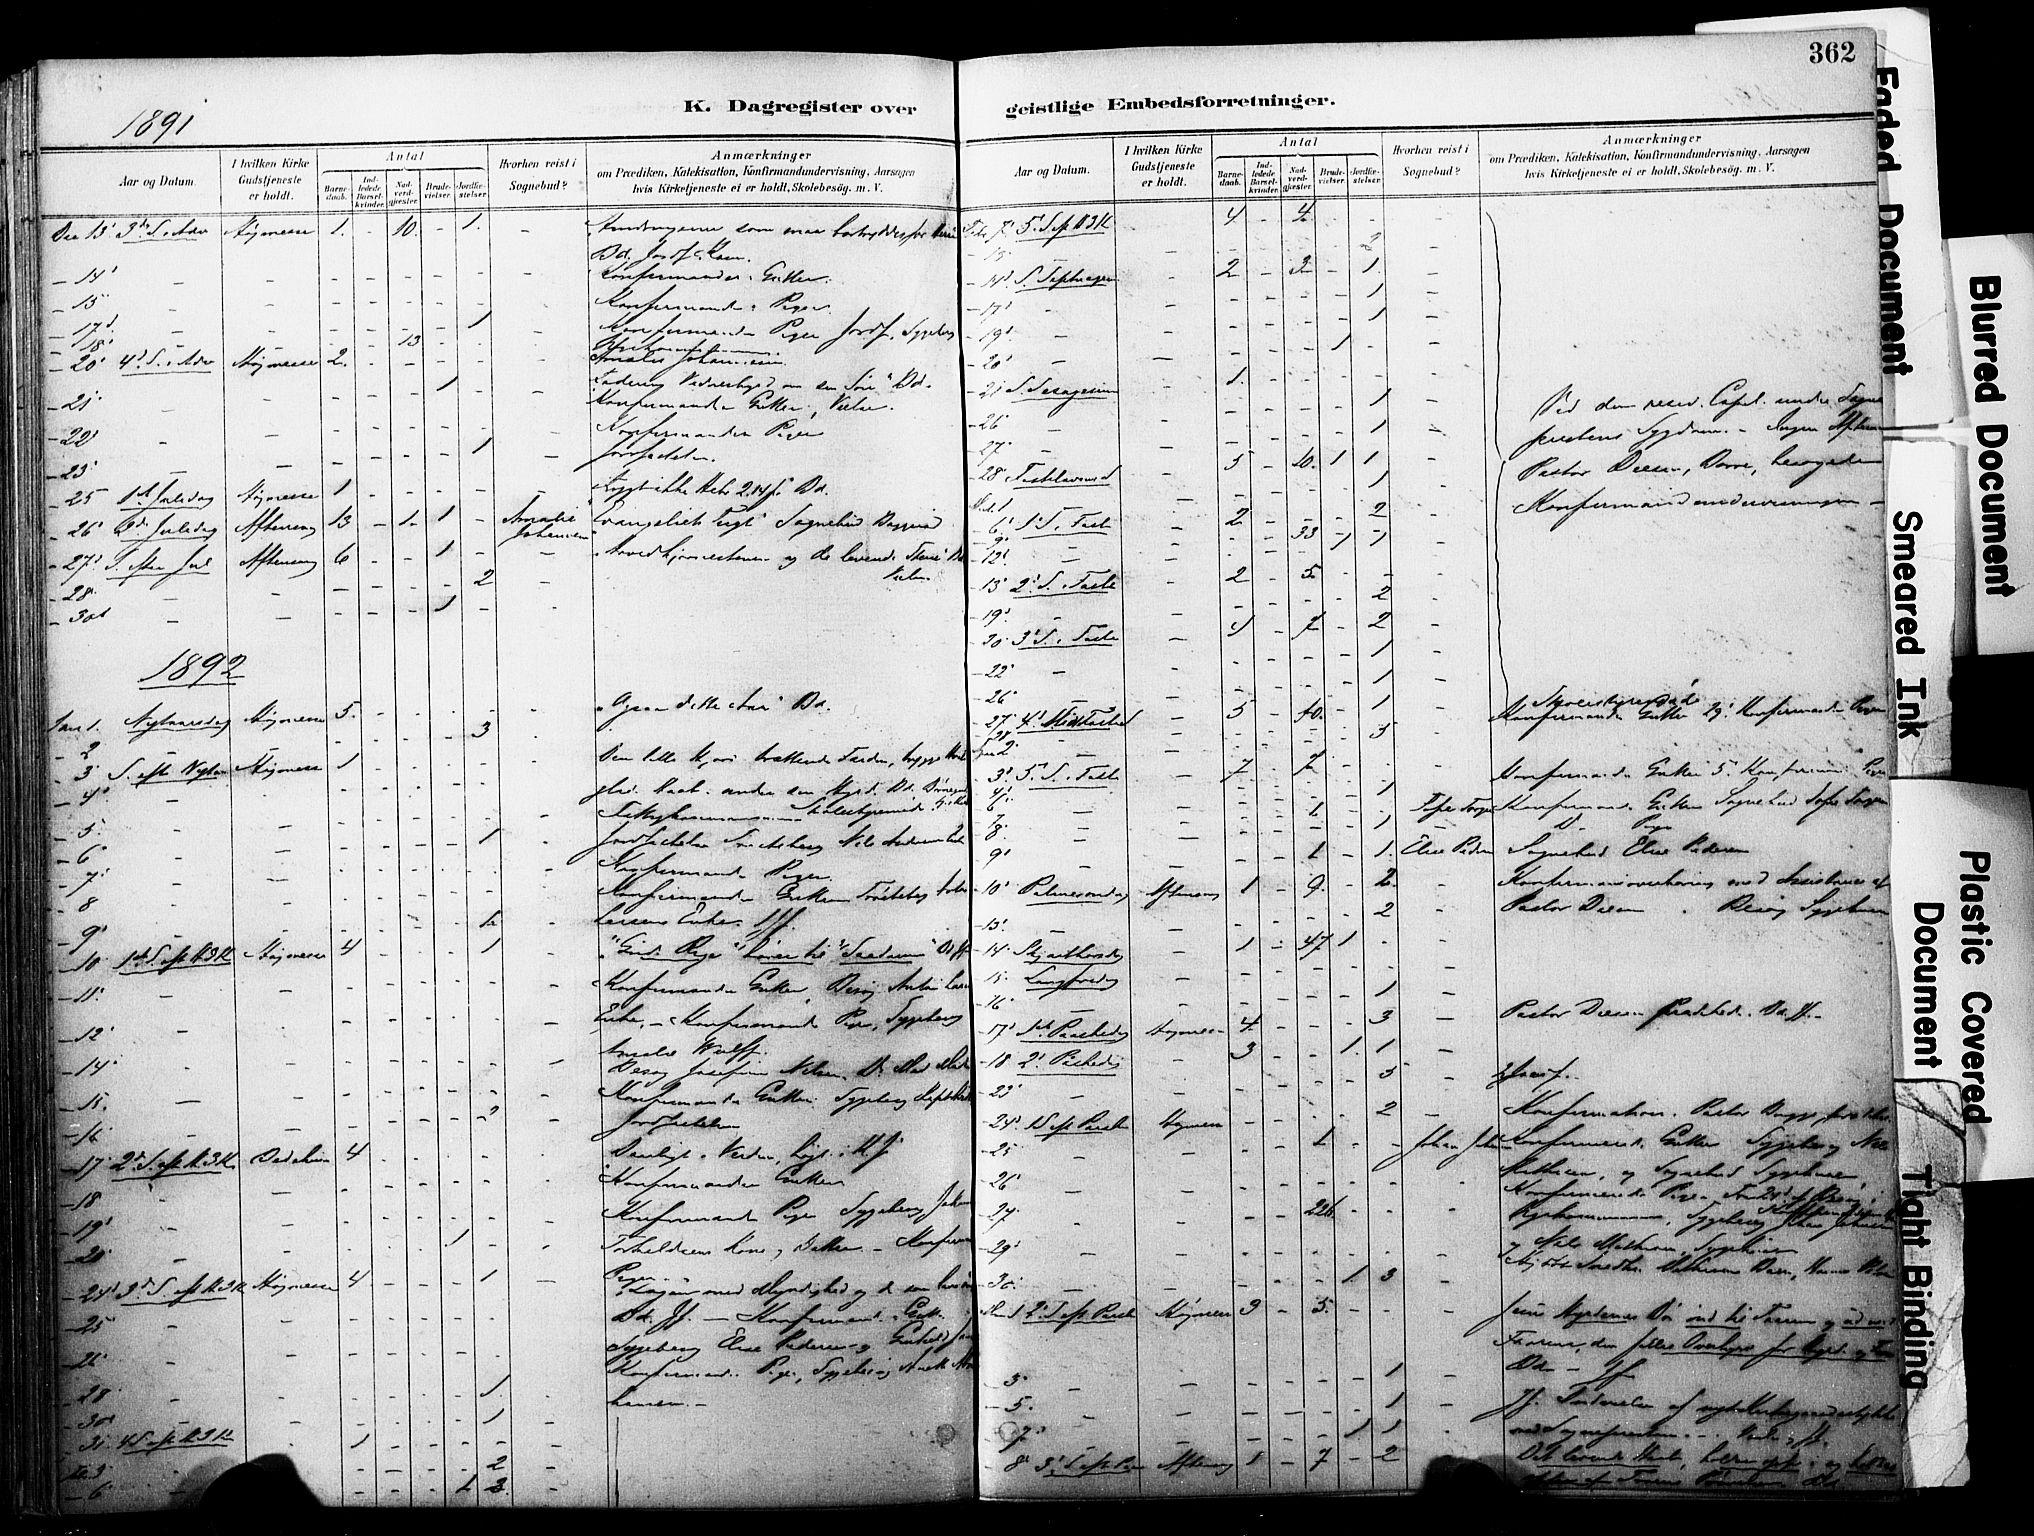 SAKO, Horten kirkebøker, F/Fa/L0004: Parish register (official) no. 4, 1888-1895, p. 362